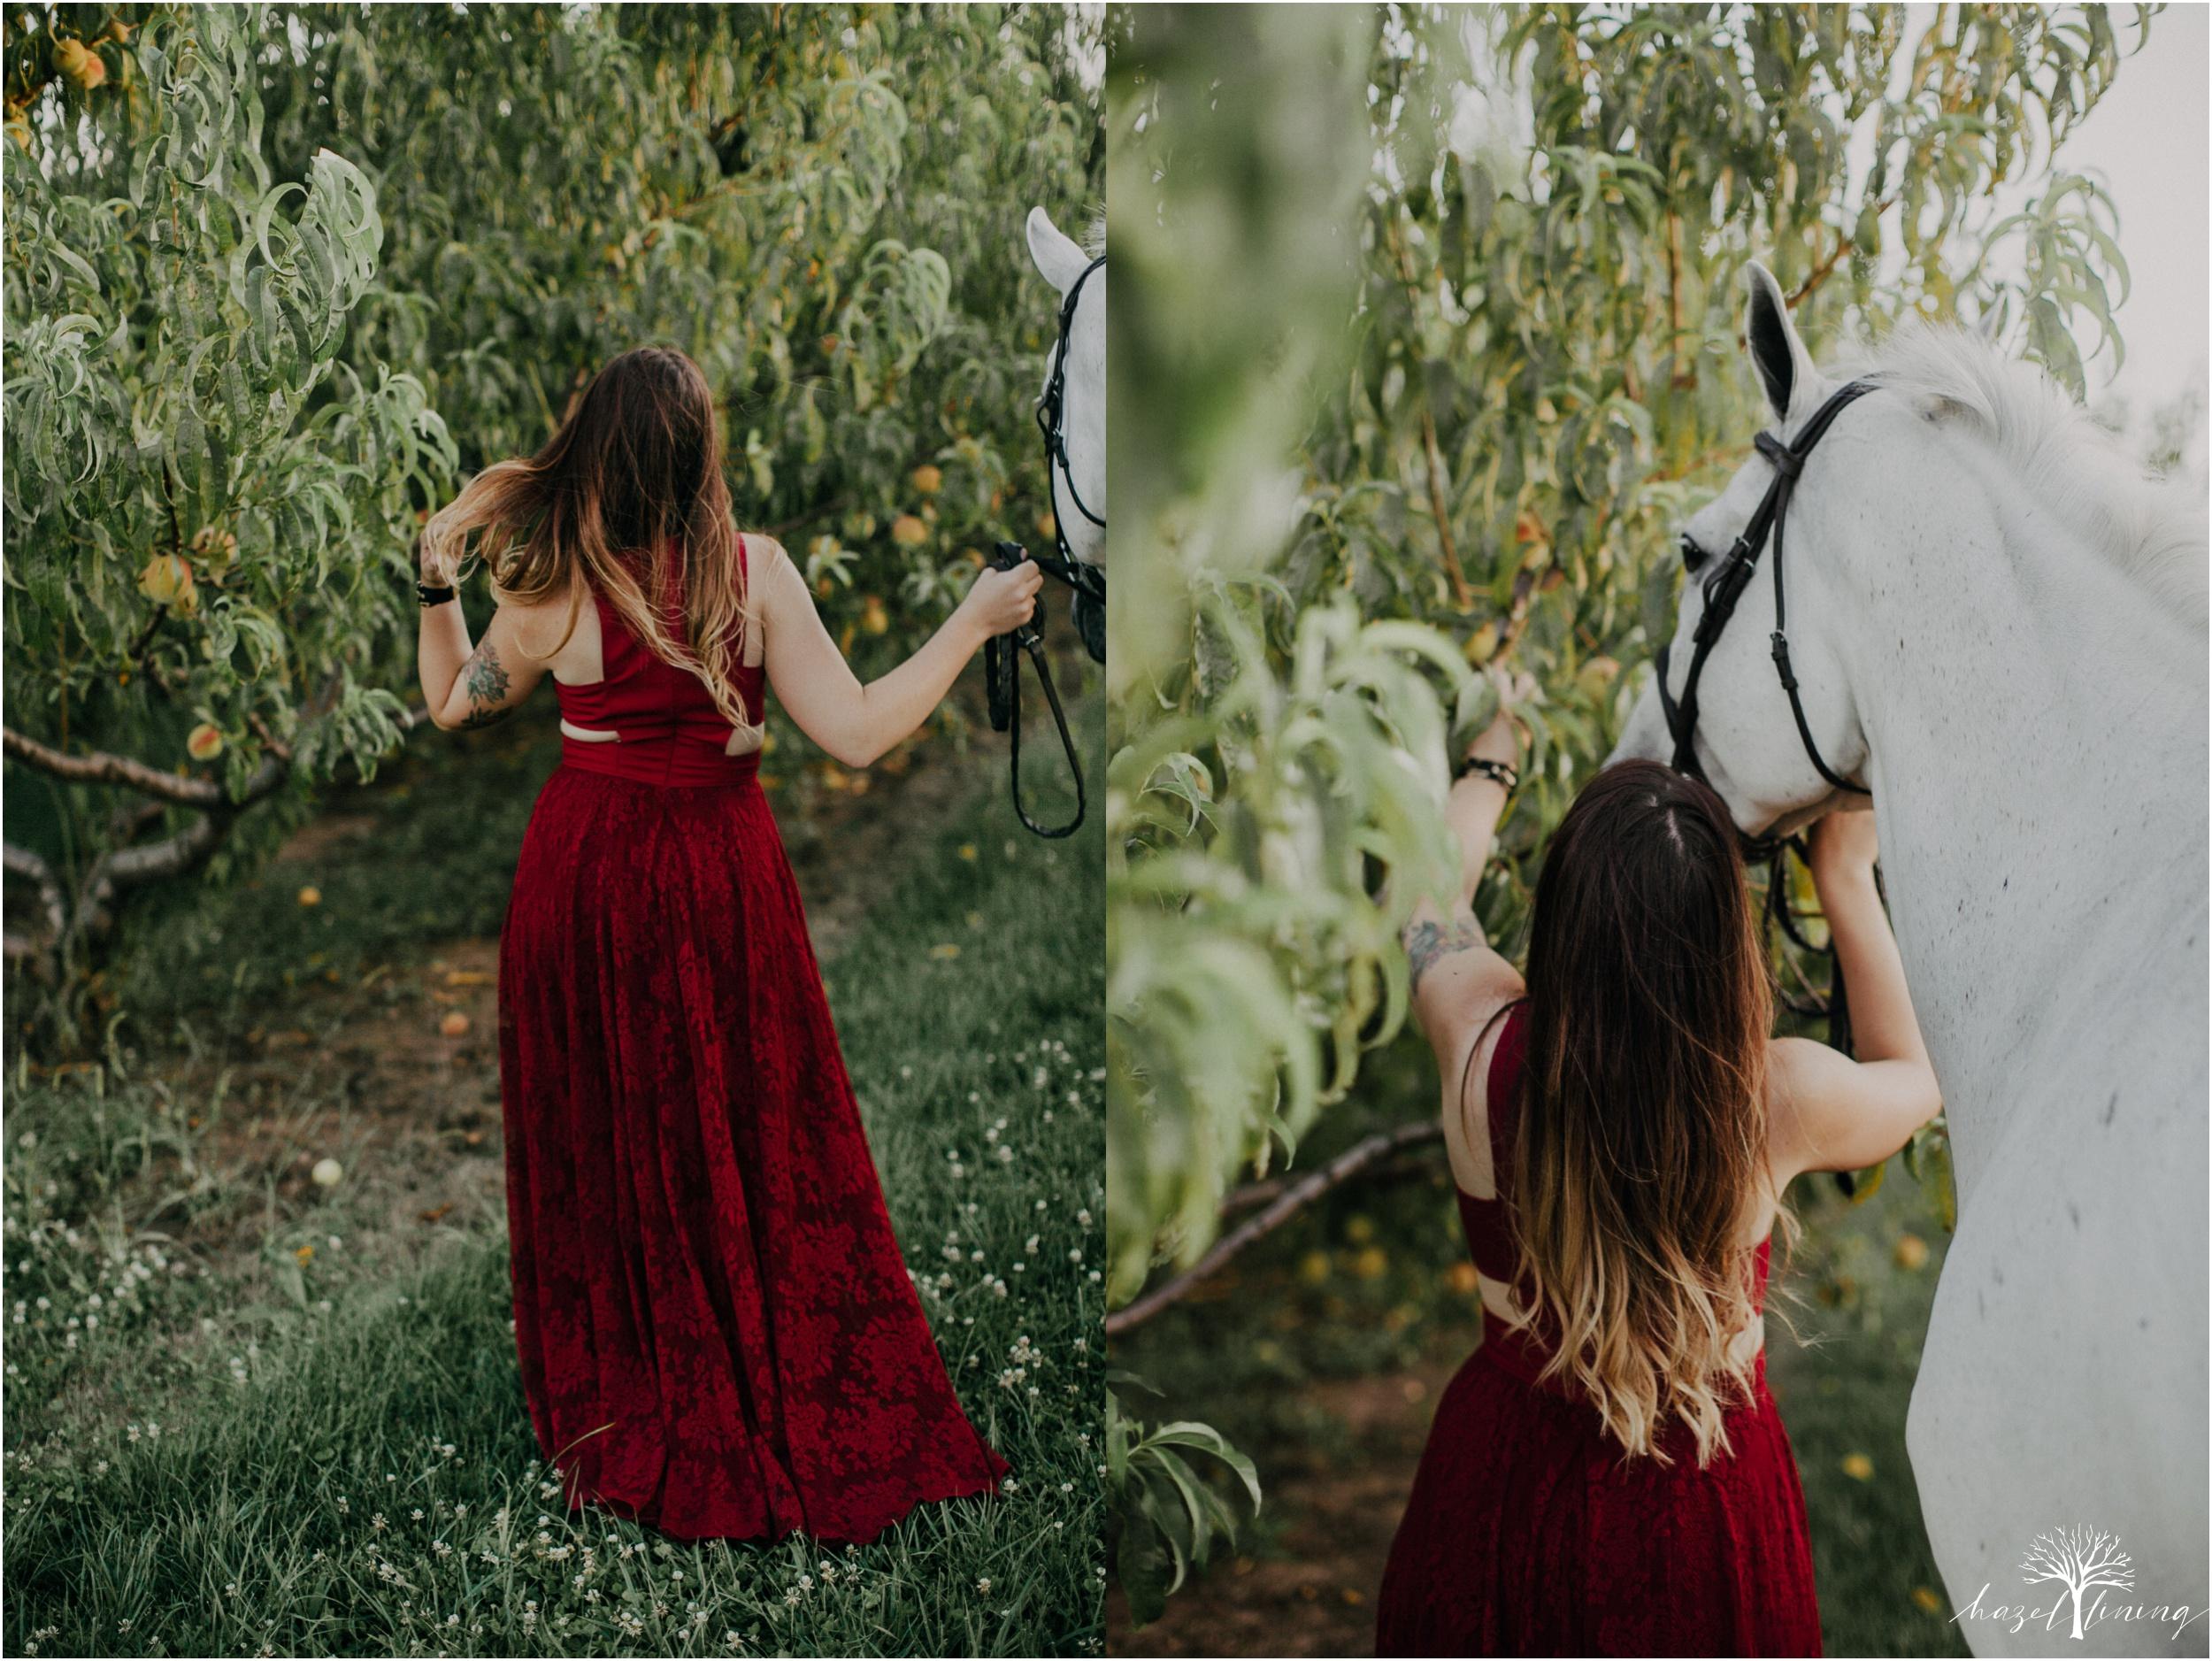 taylor-adams-and-horse-delaware-valley-university-delval-summer-equestrian-portrait-session-hazel-lining-photography-destination-elopement-wedding-engagement-photography_0040.jpg